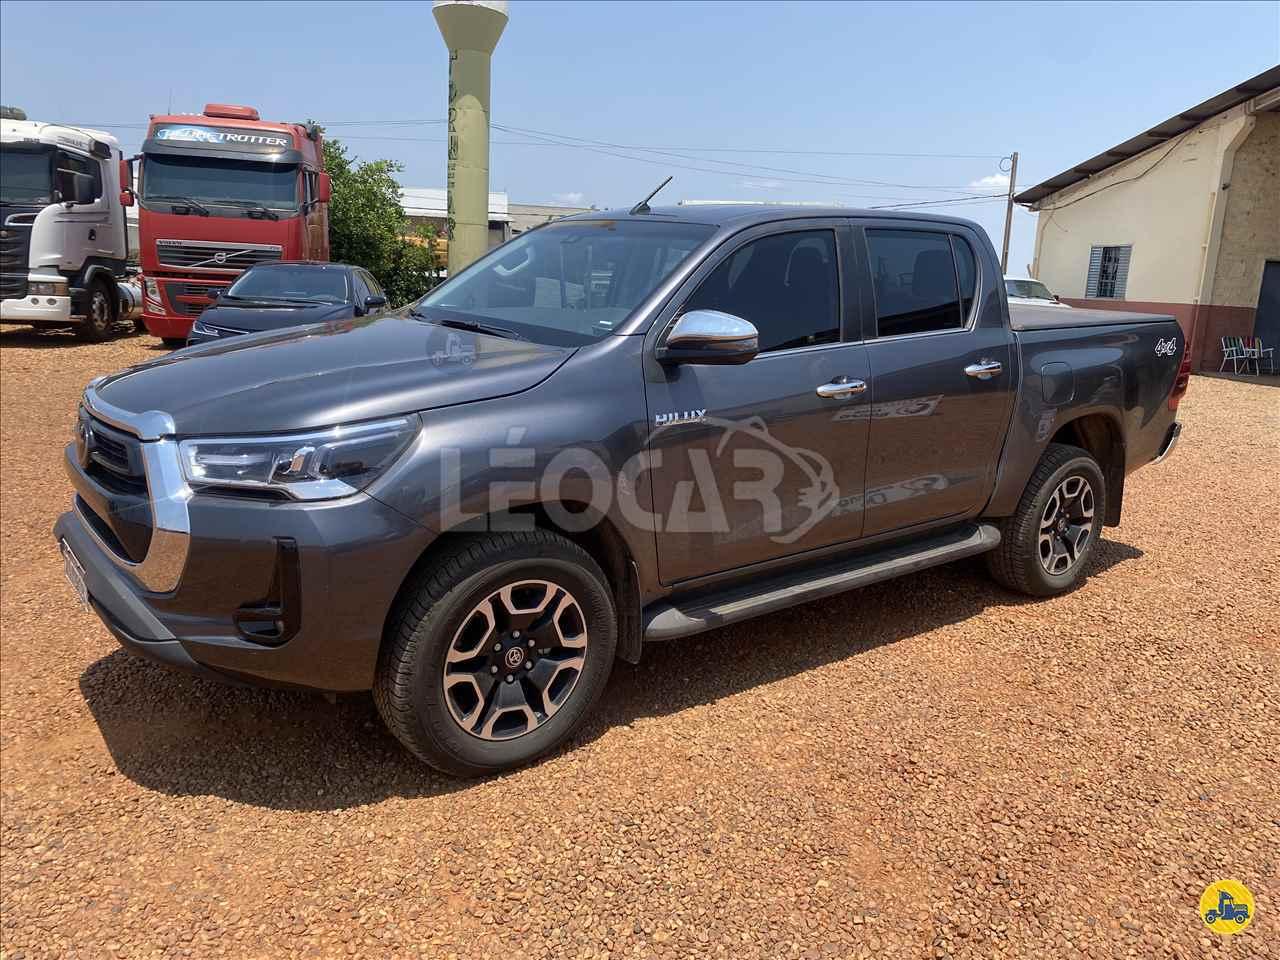 CARRO TOYOTA Hilux 2.8 SRX Leocar Caminhões PRIMAVERA DO LESTE MATO GROSSO MT